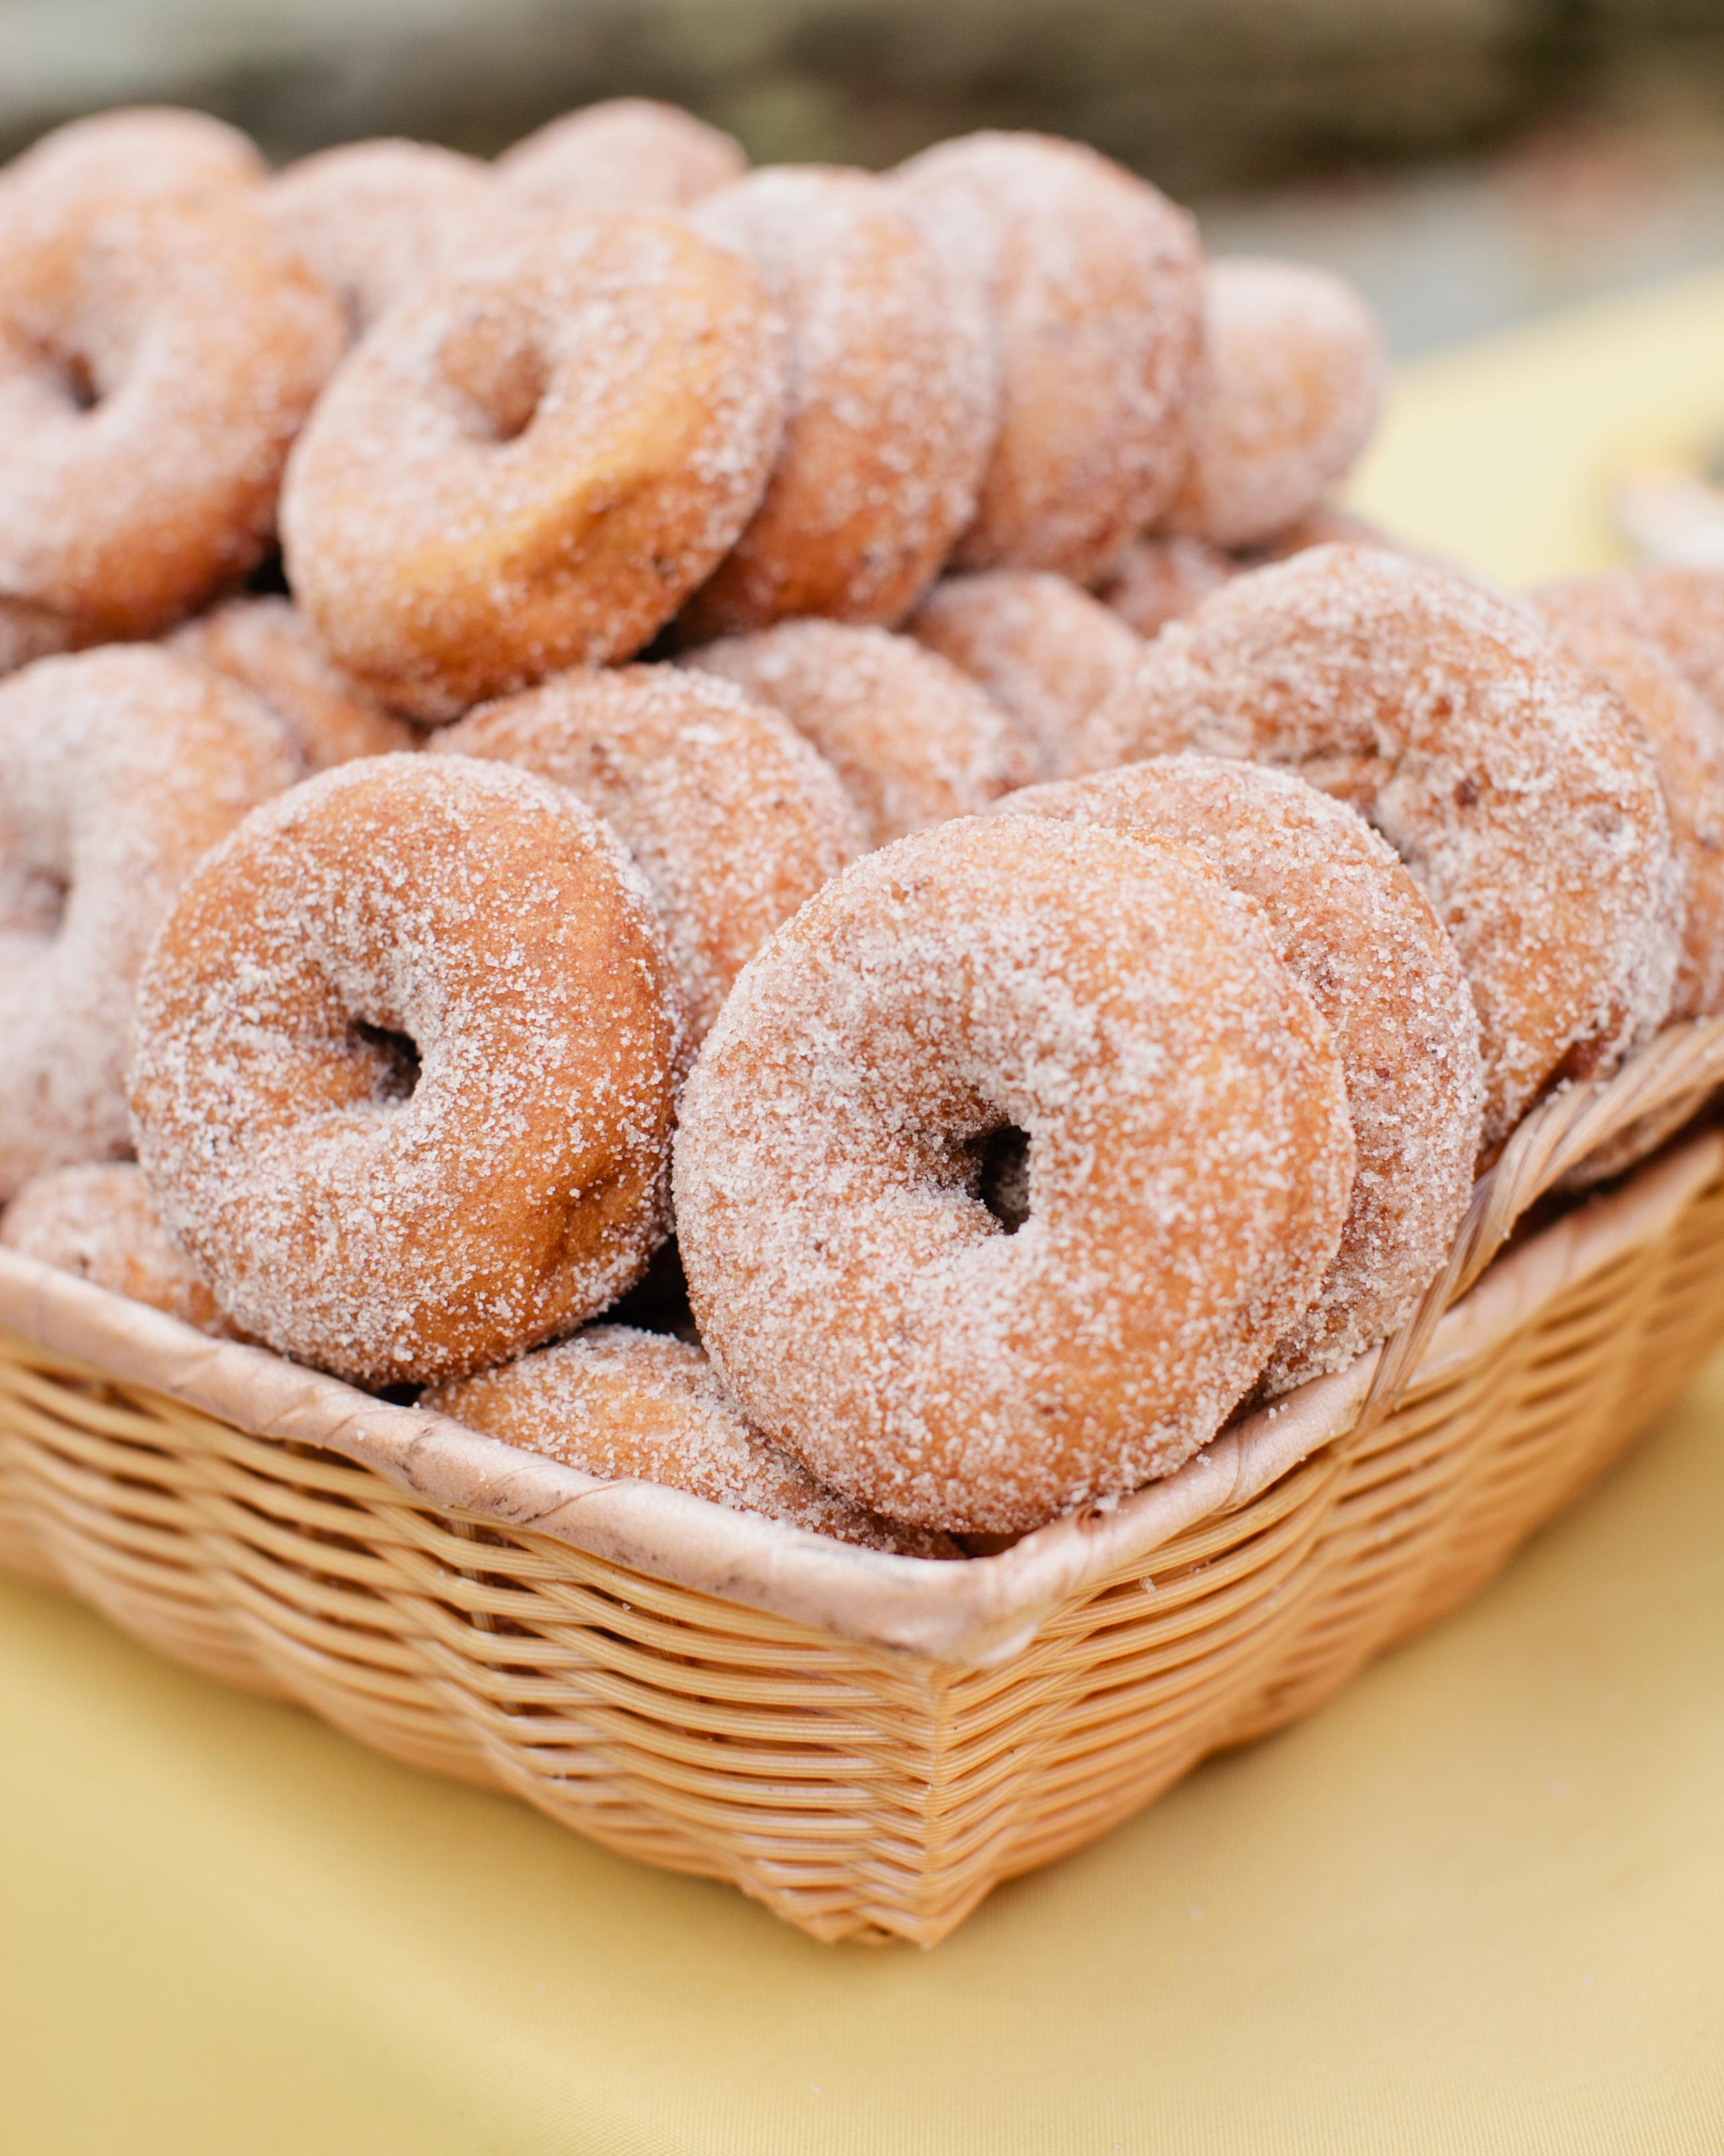 jess-steve-wedding-donuts-45-s112362-1115.jpg